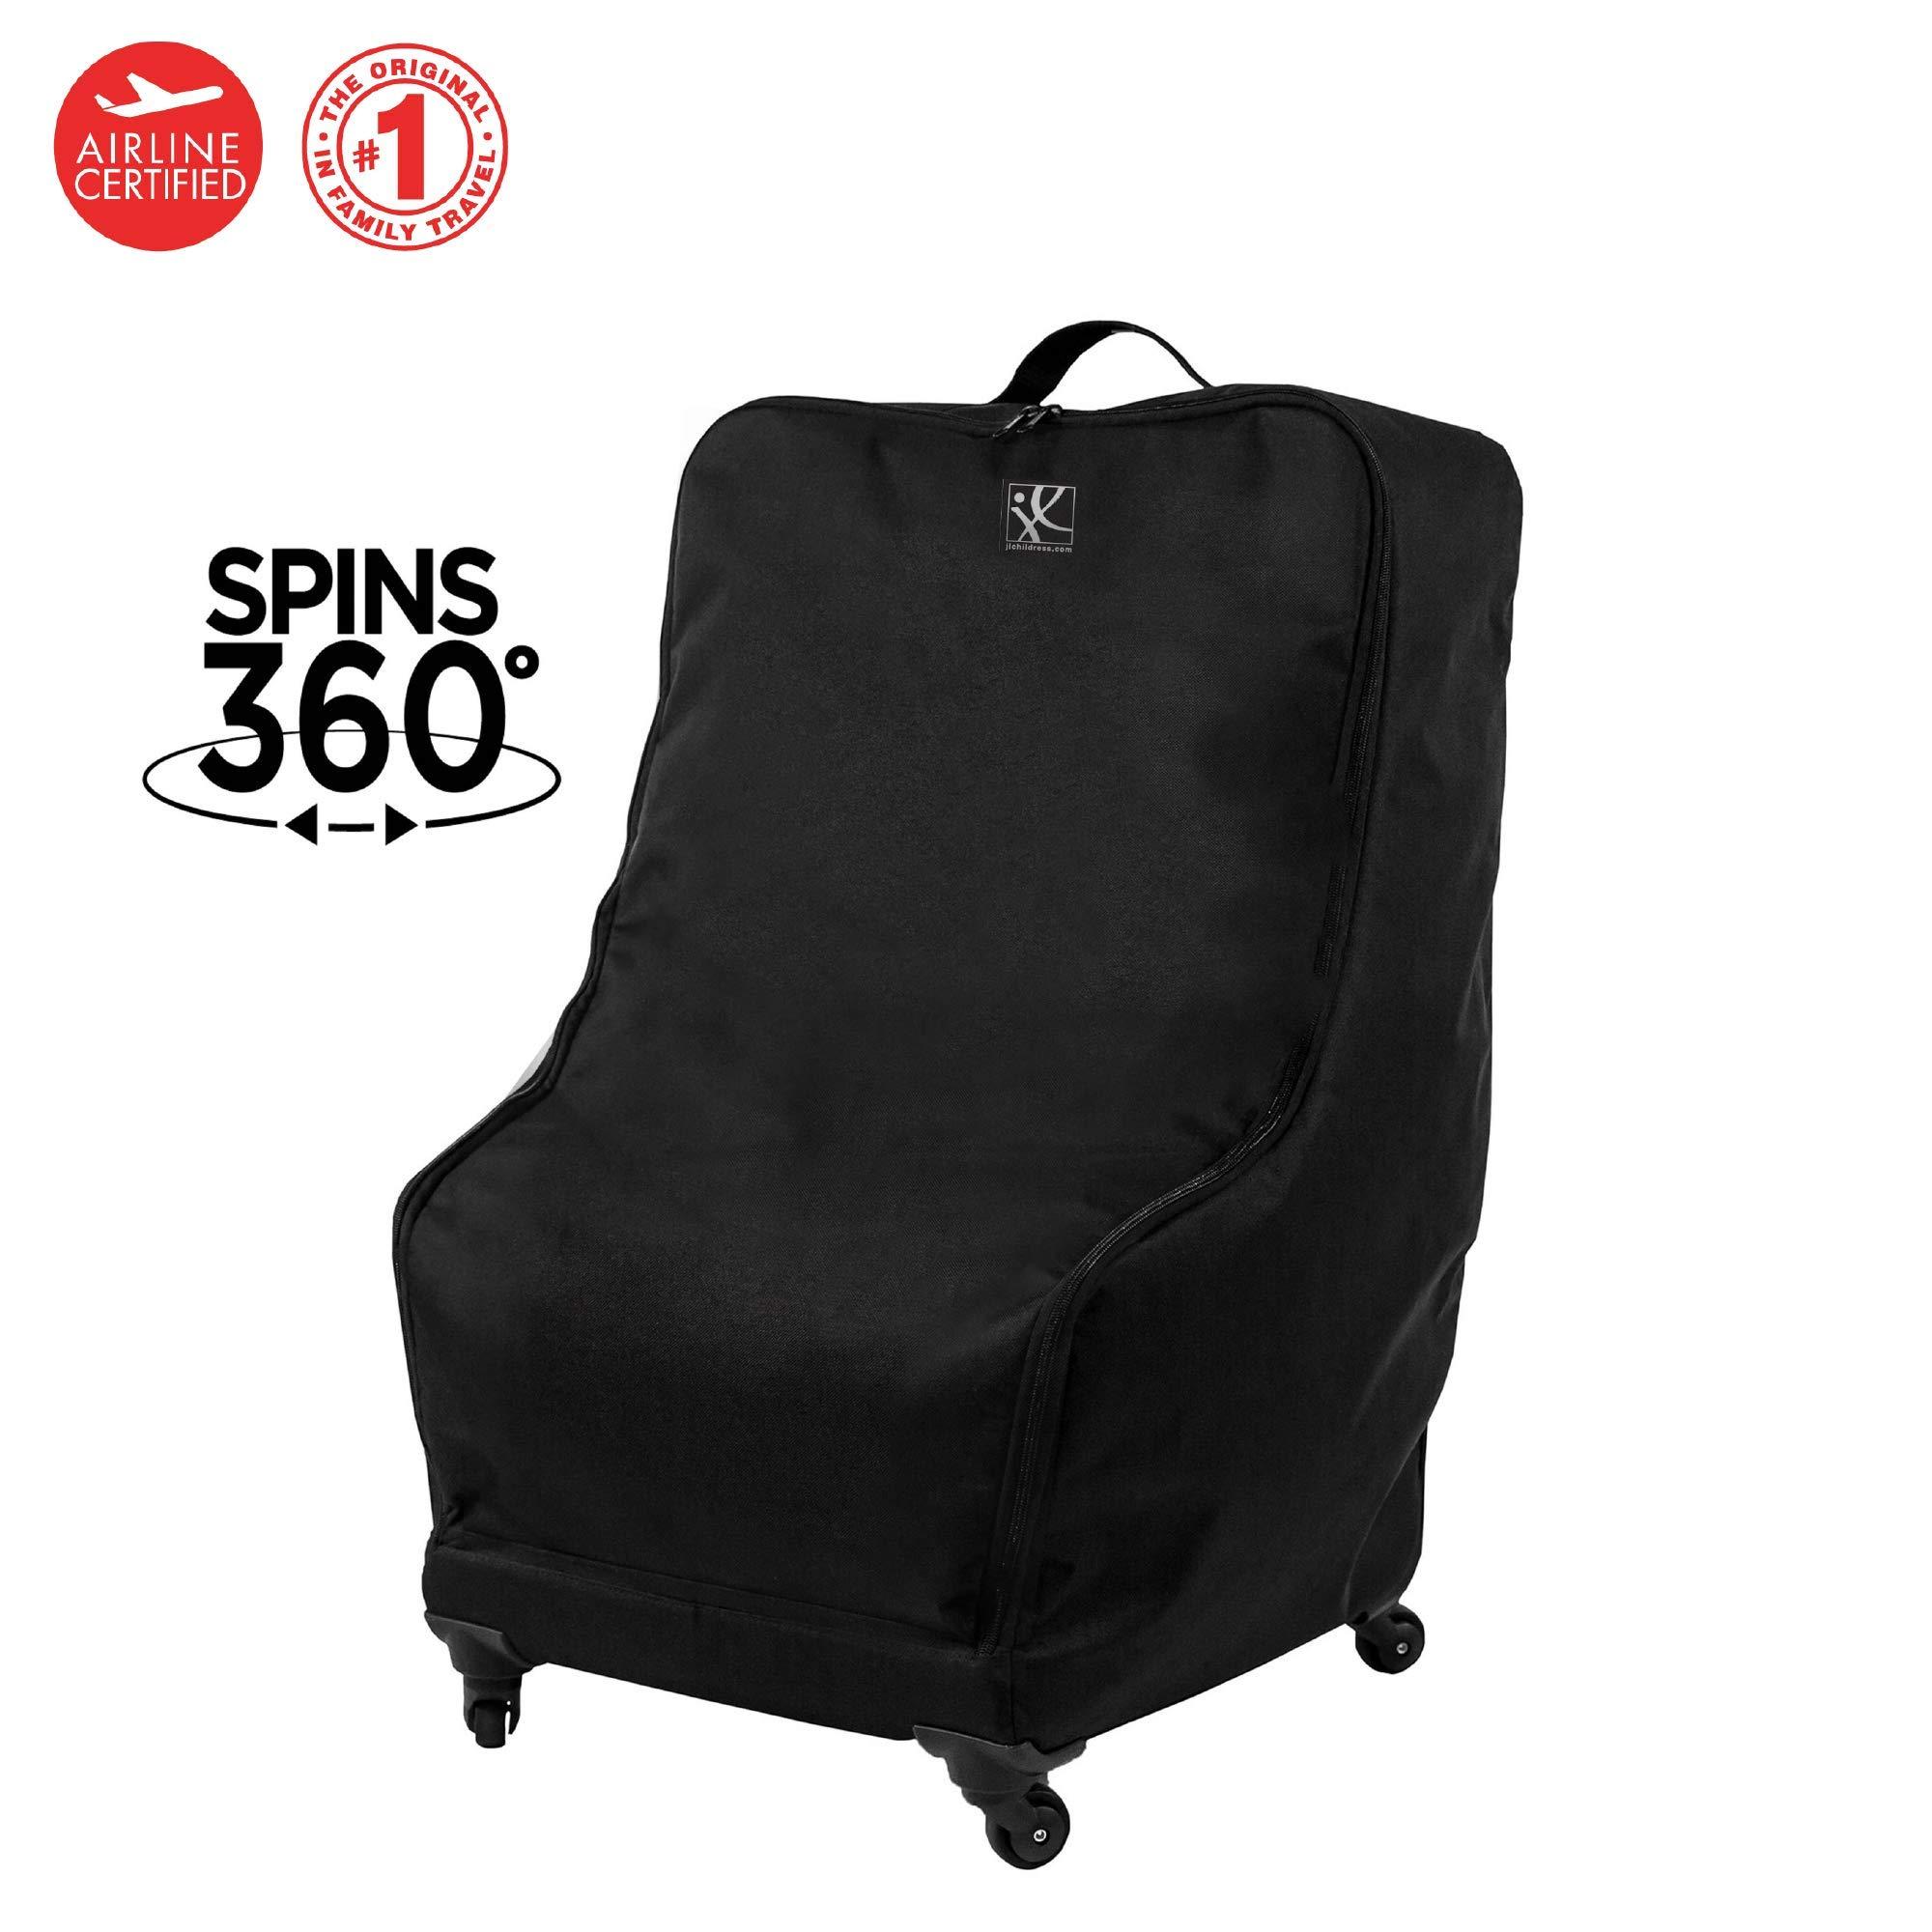 J.L. Childress Spinner Wheelie Deluxe Car Seat Travel Bag, Black by J.L. Childress